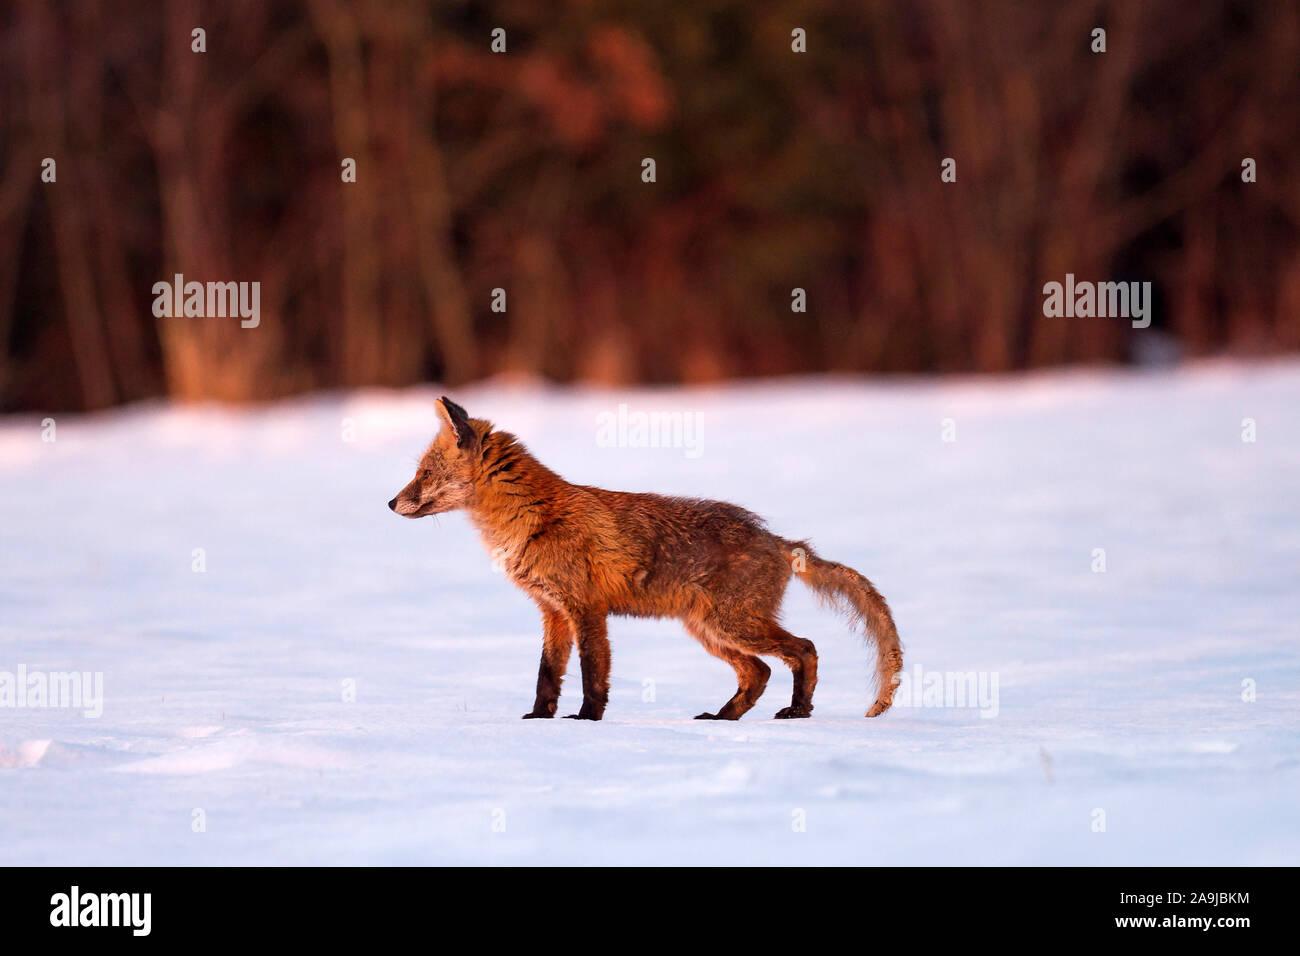 Fuchs (Vulpes vulpes) Stock Photo